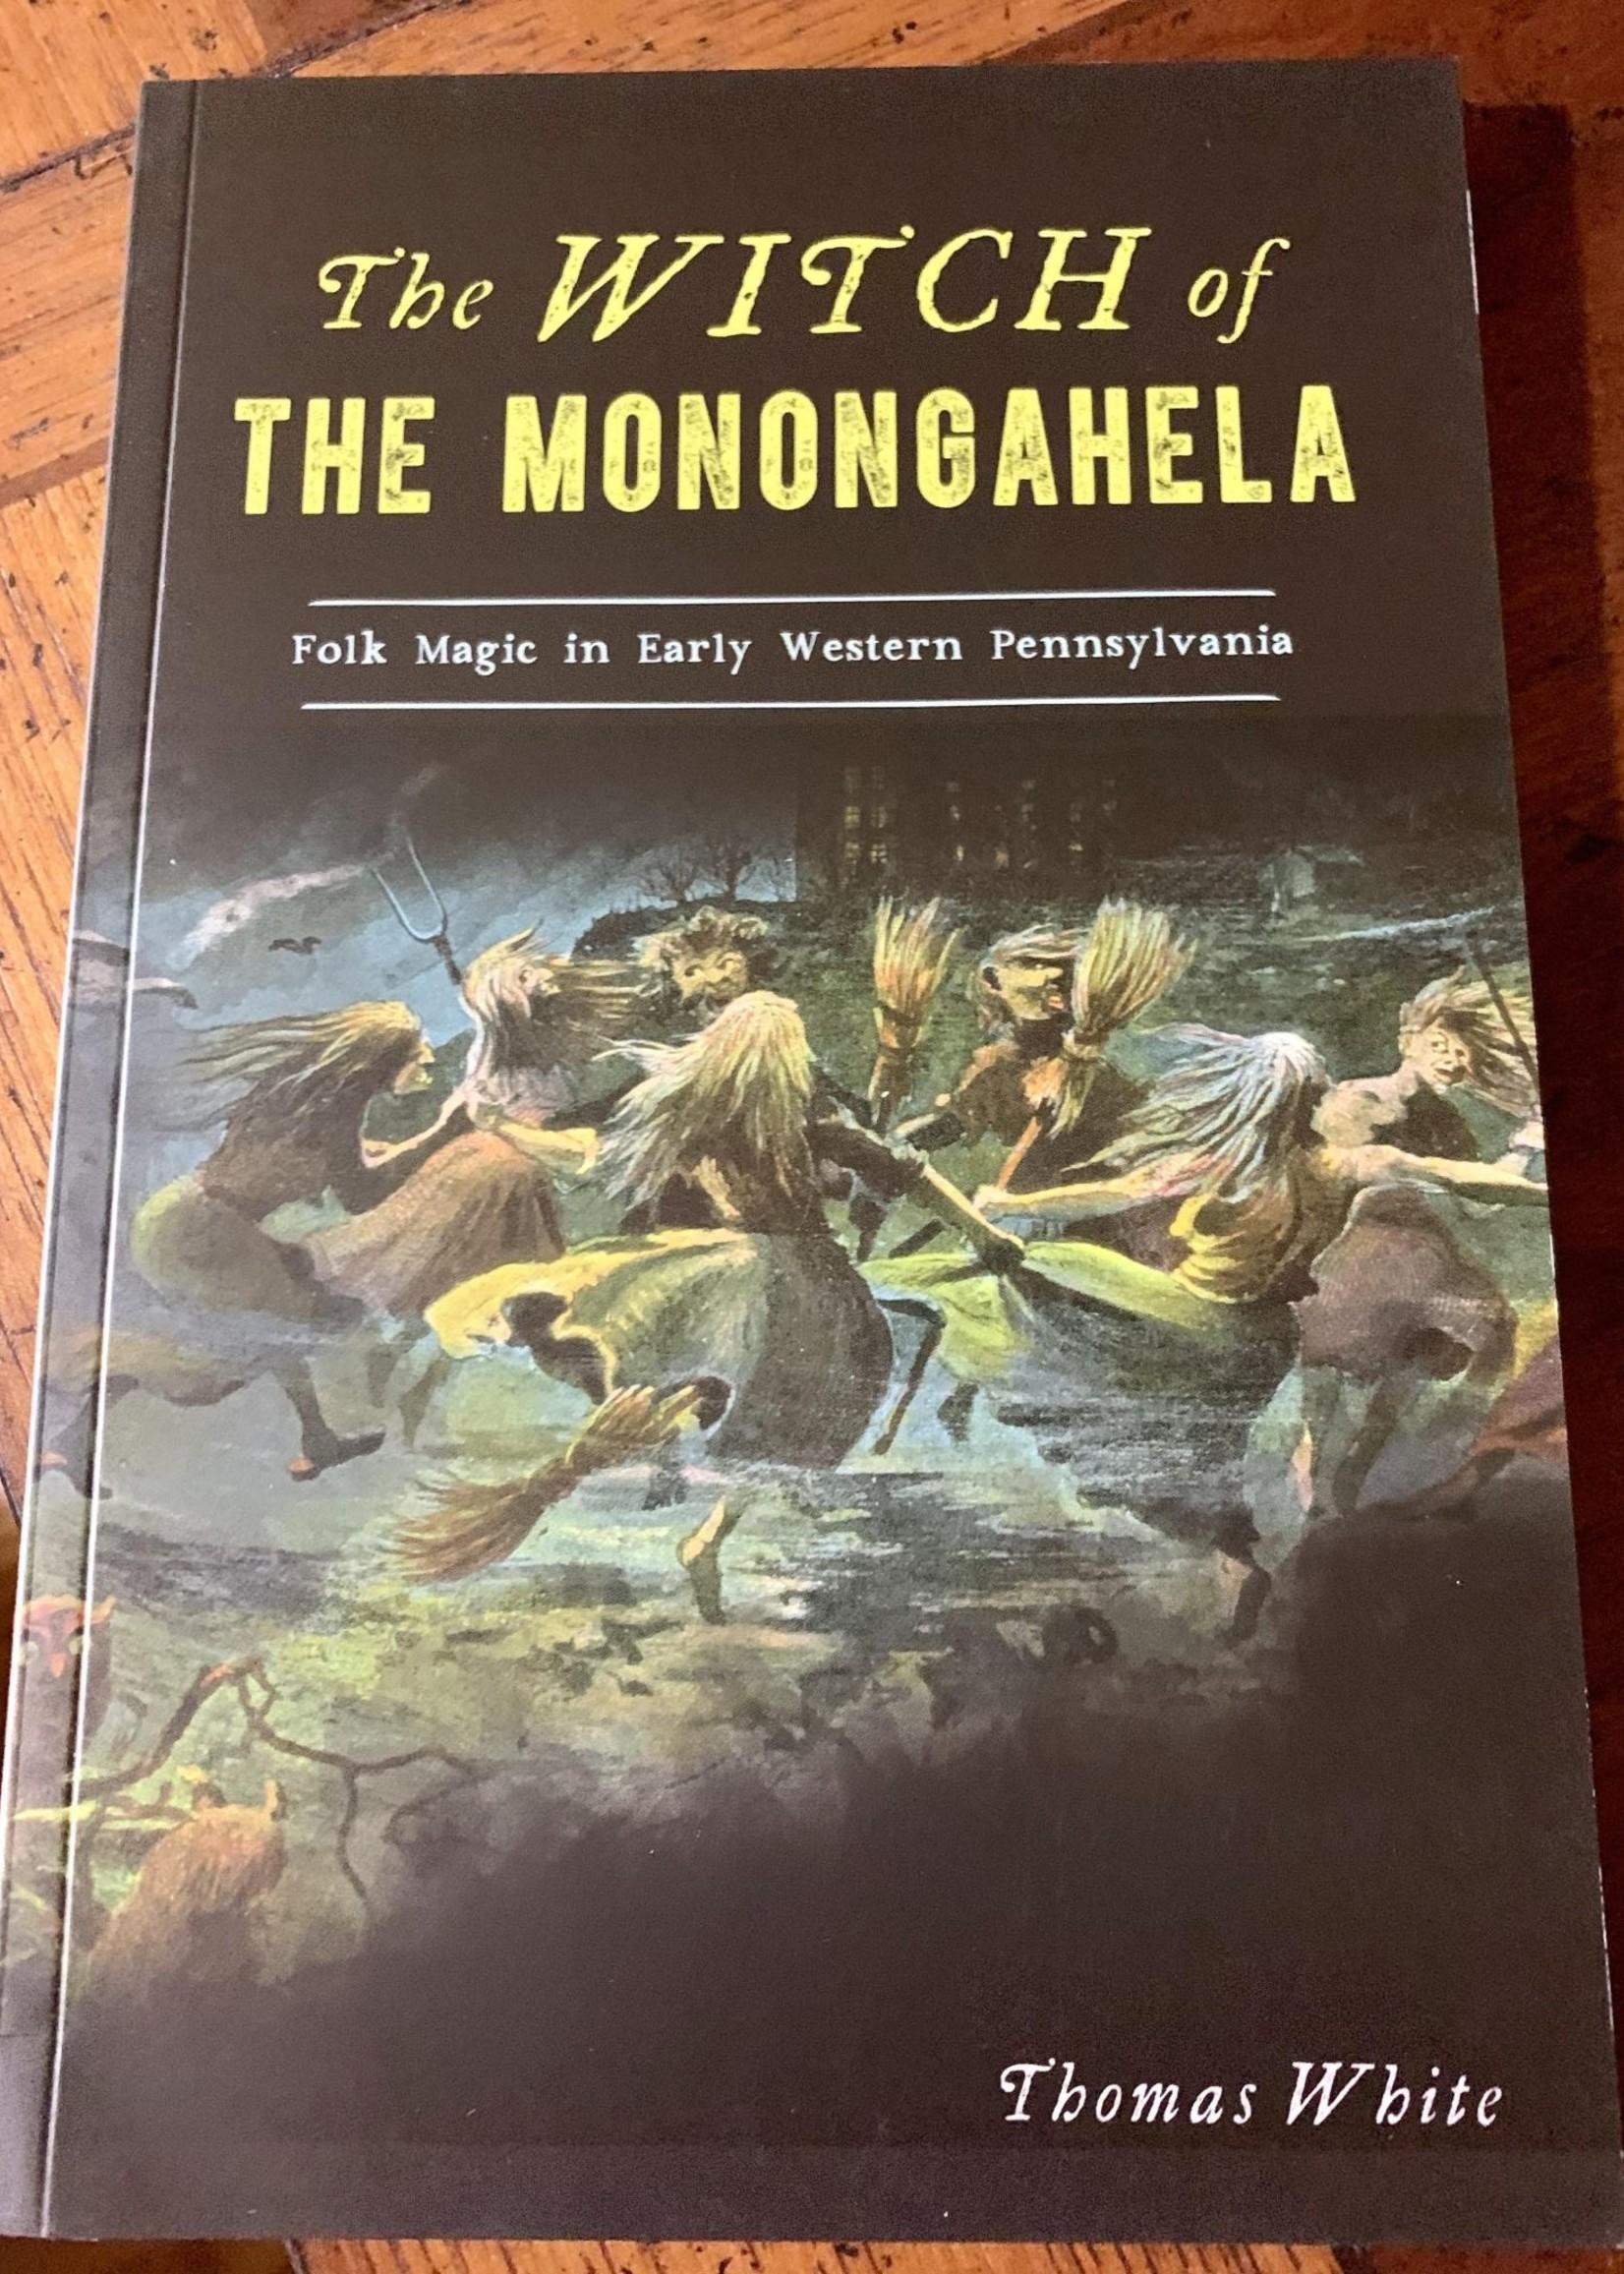 The Witch of the Monongahela: Folk Magic in Early Western Pennsylvania - Thomas White